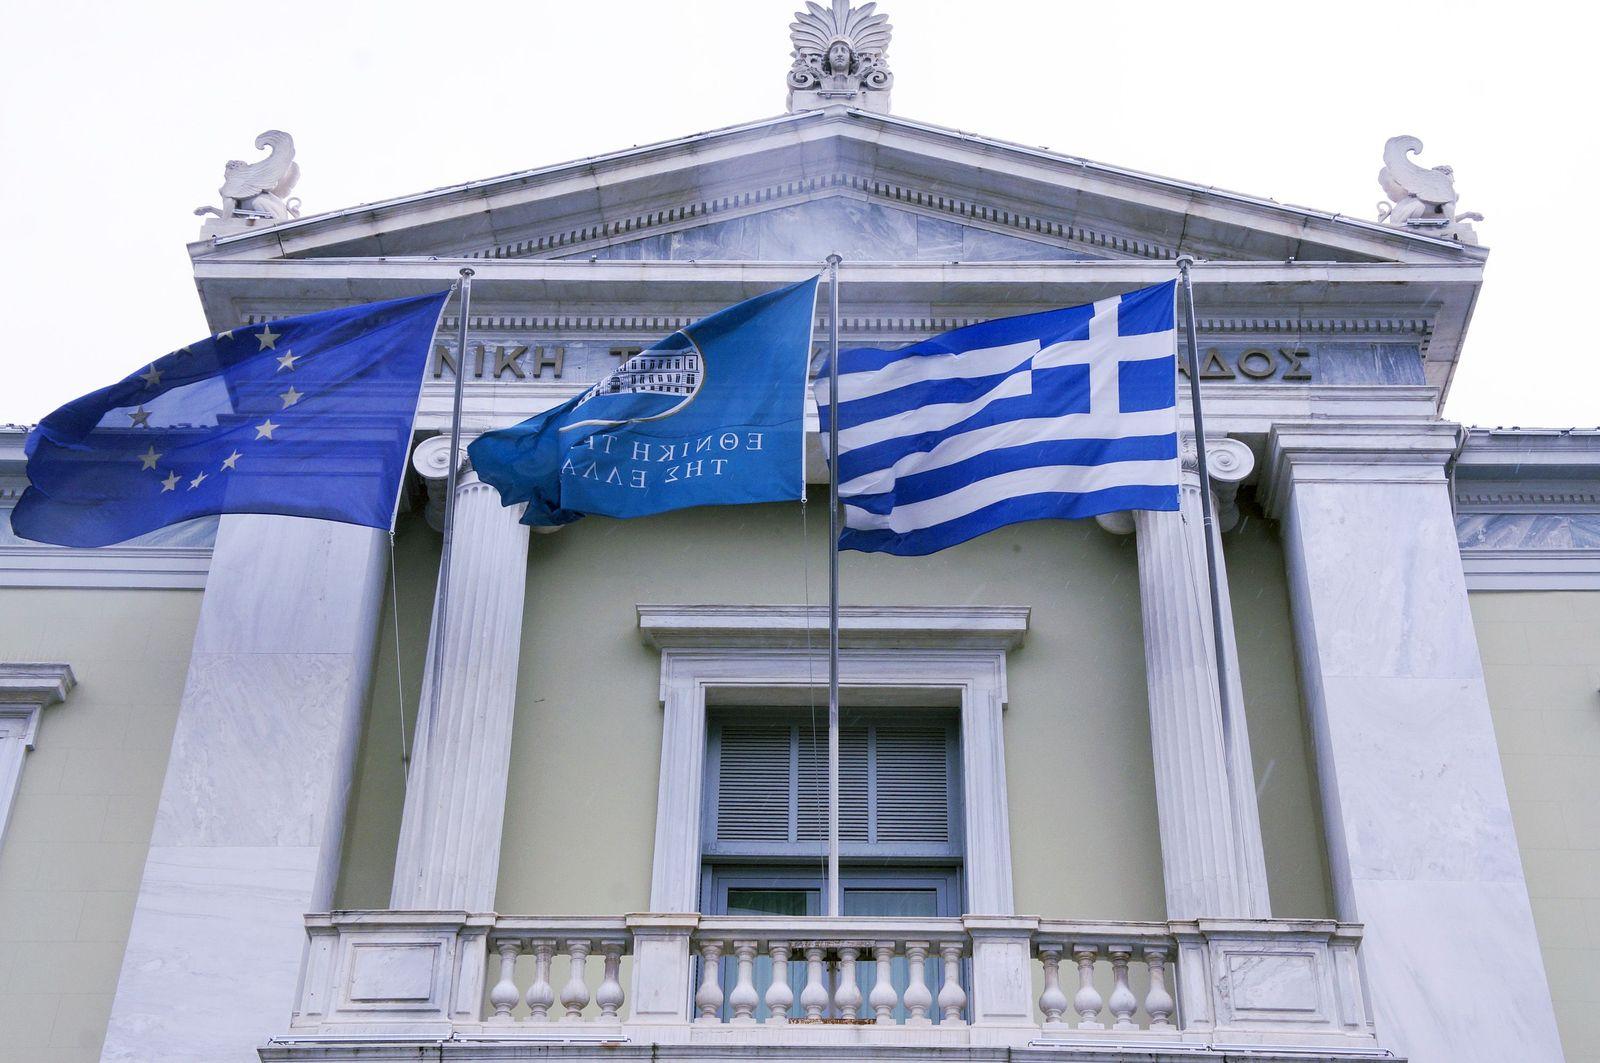 Griechische Nationalbank / Athen